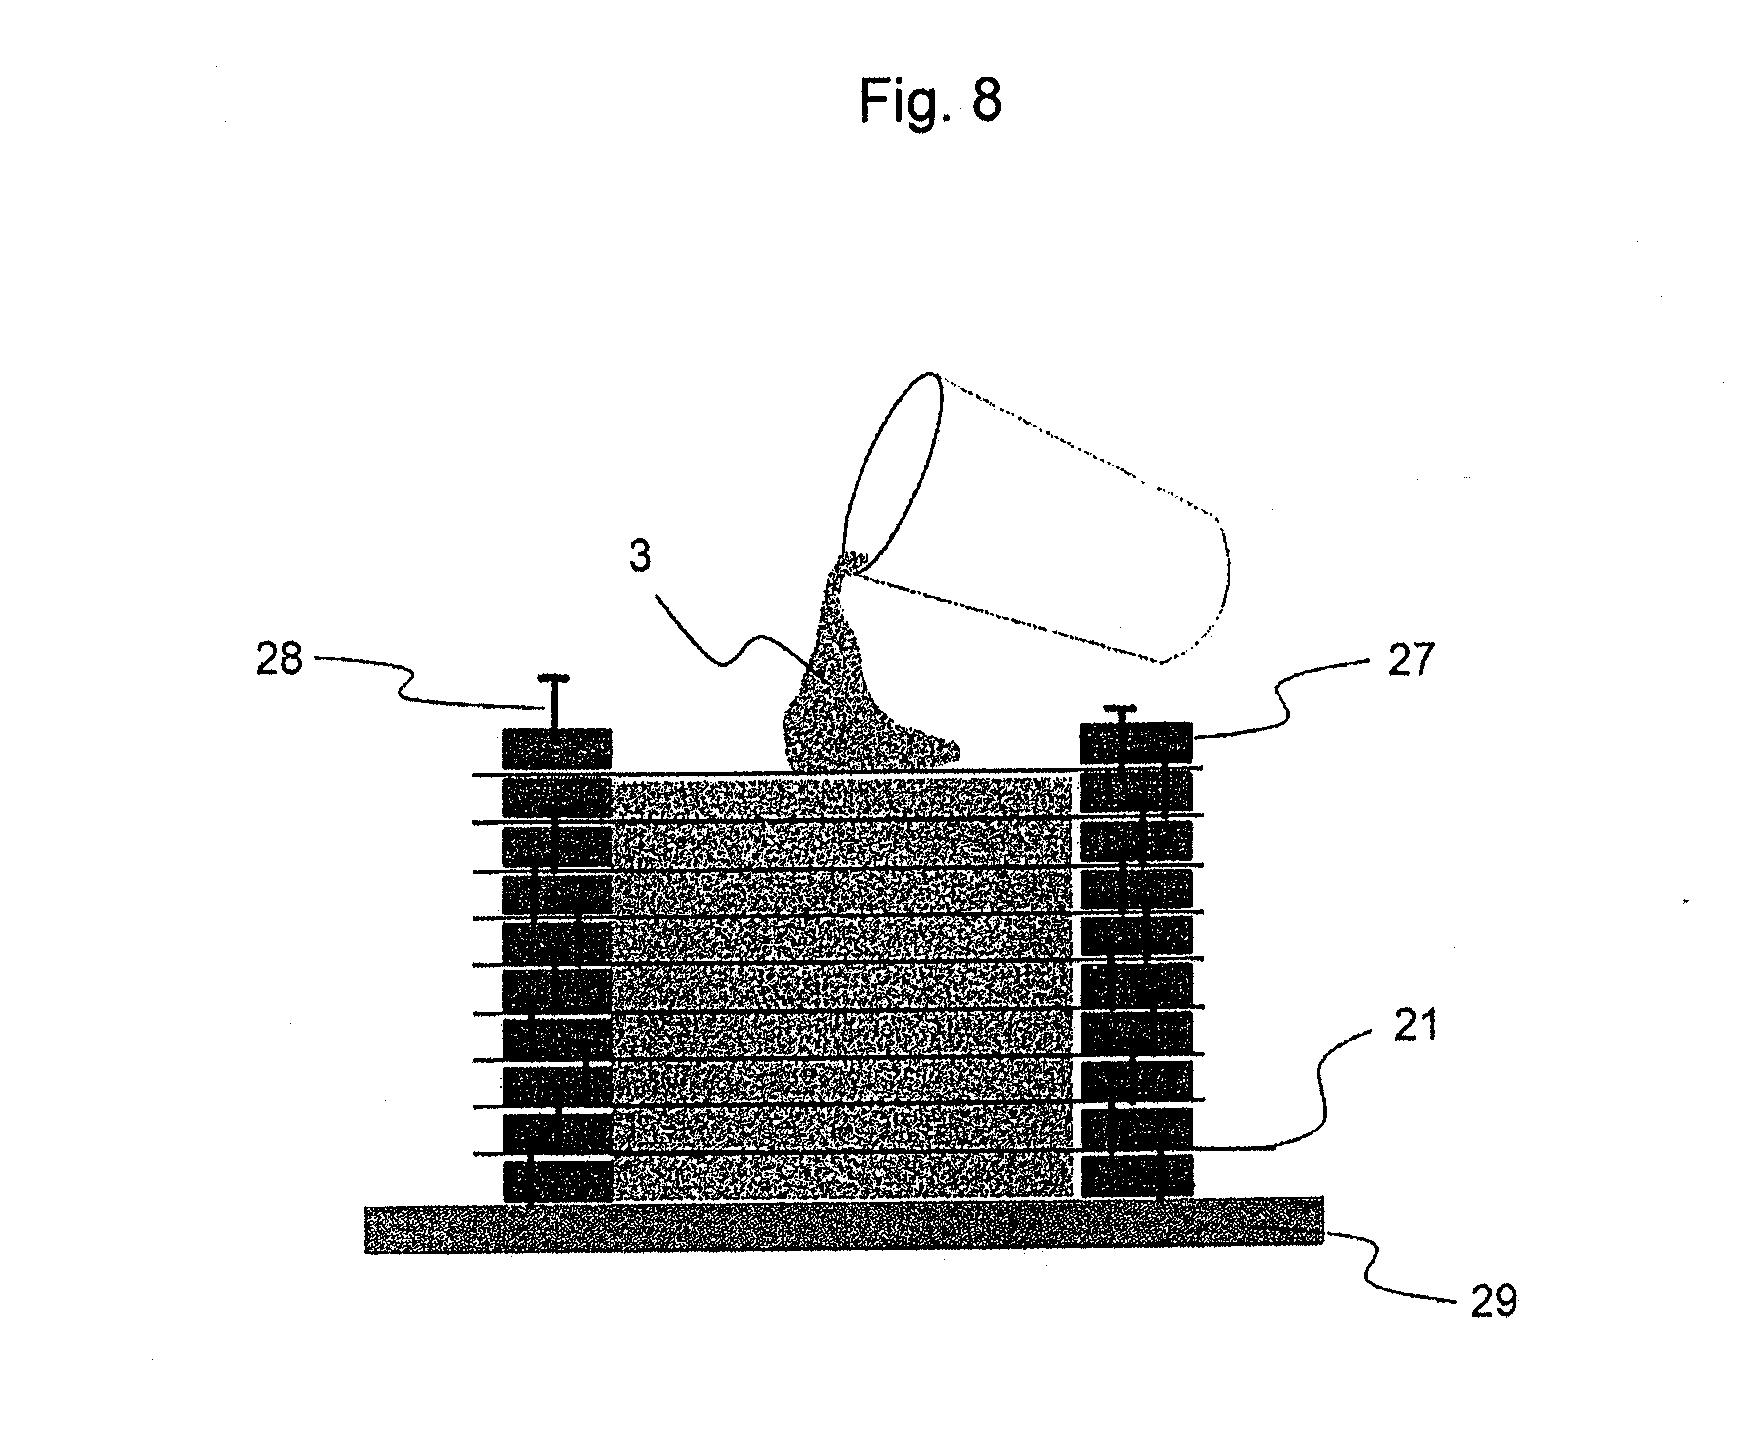 Light Transmitting Concrete Patent Us20110185660 Translucent Building Element And Equipment